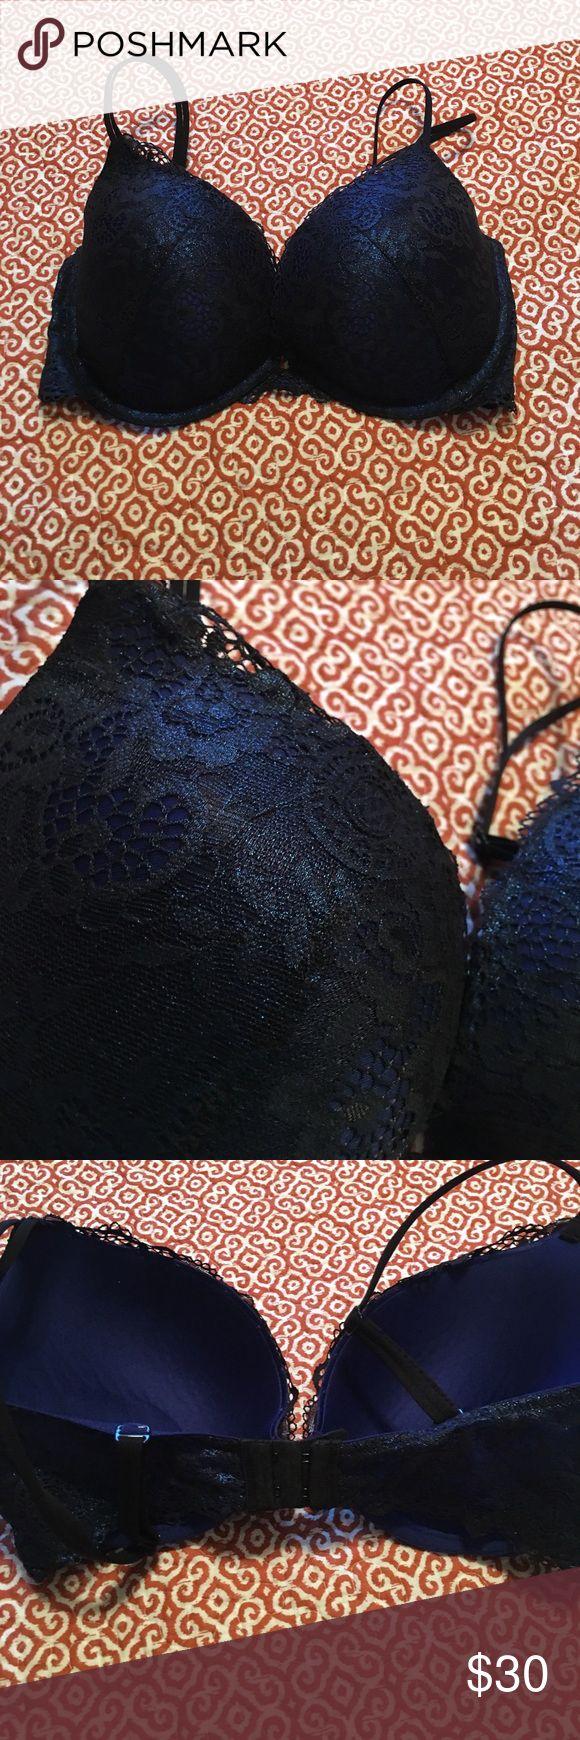 Vitoria Secret Push Up Bra Another gorgeous bra! Victoria's Secret Intimates & Sleepwear Bras